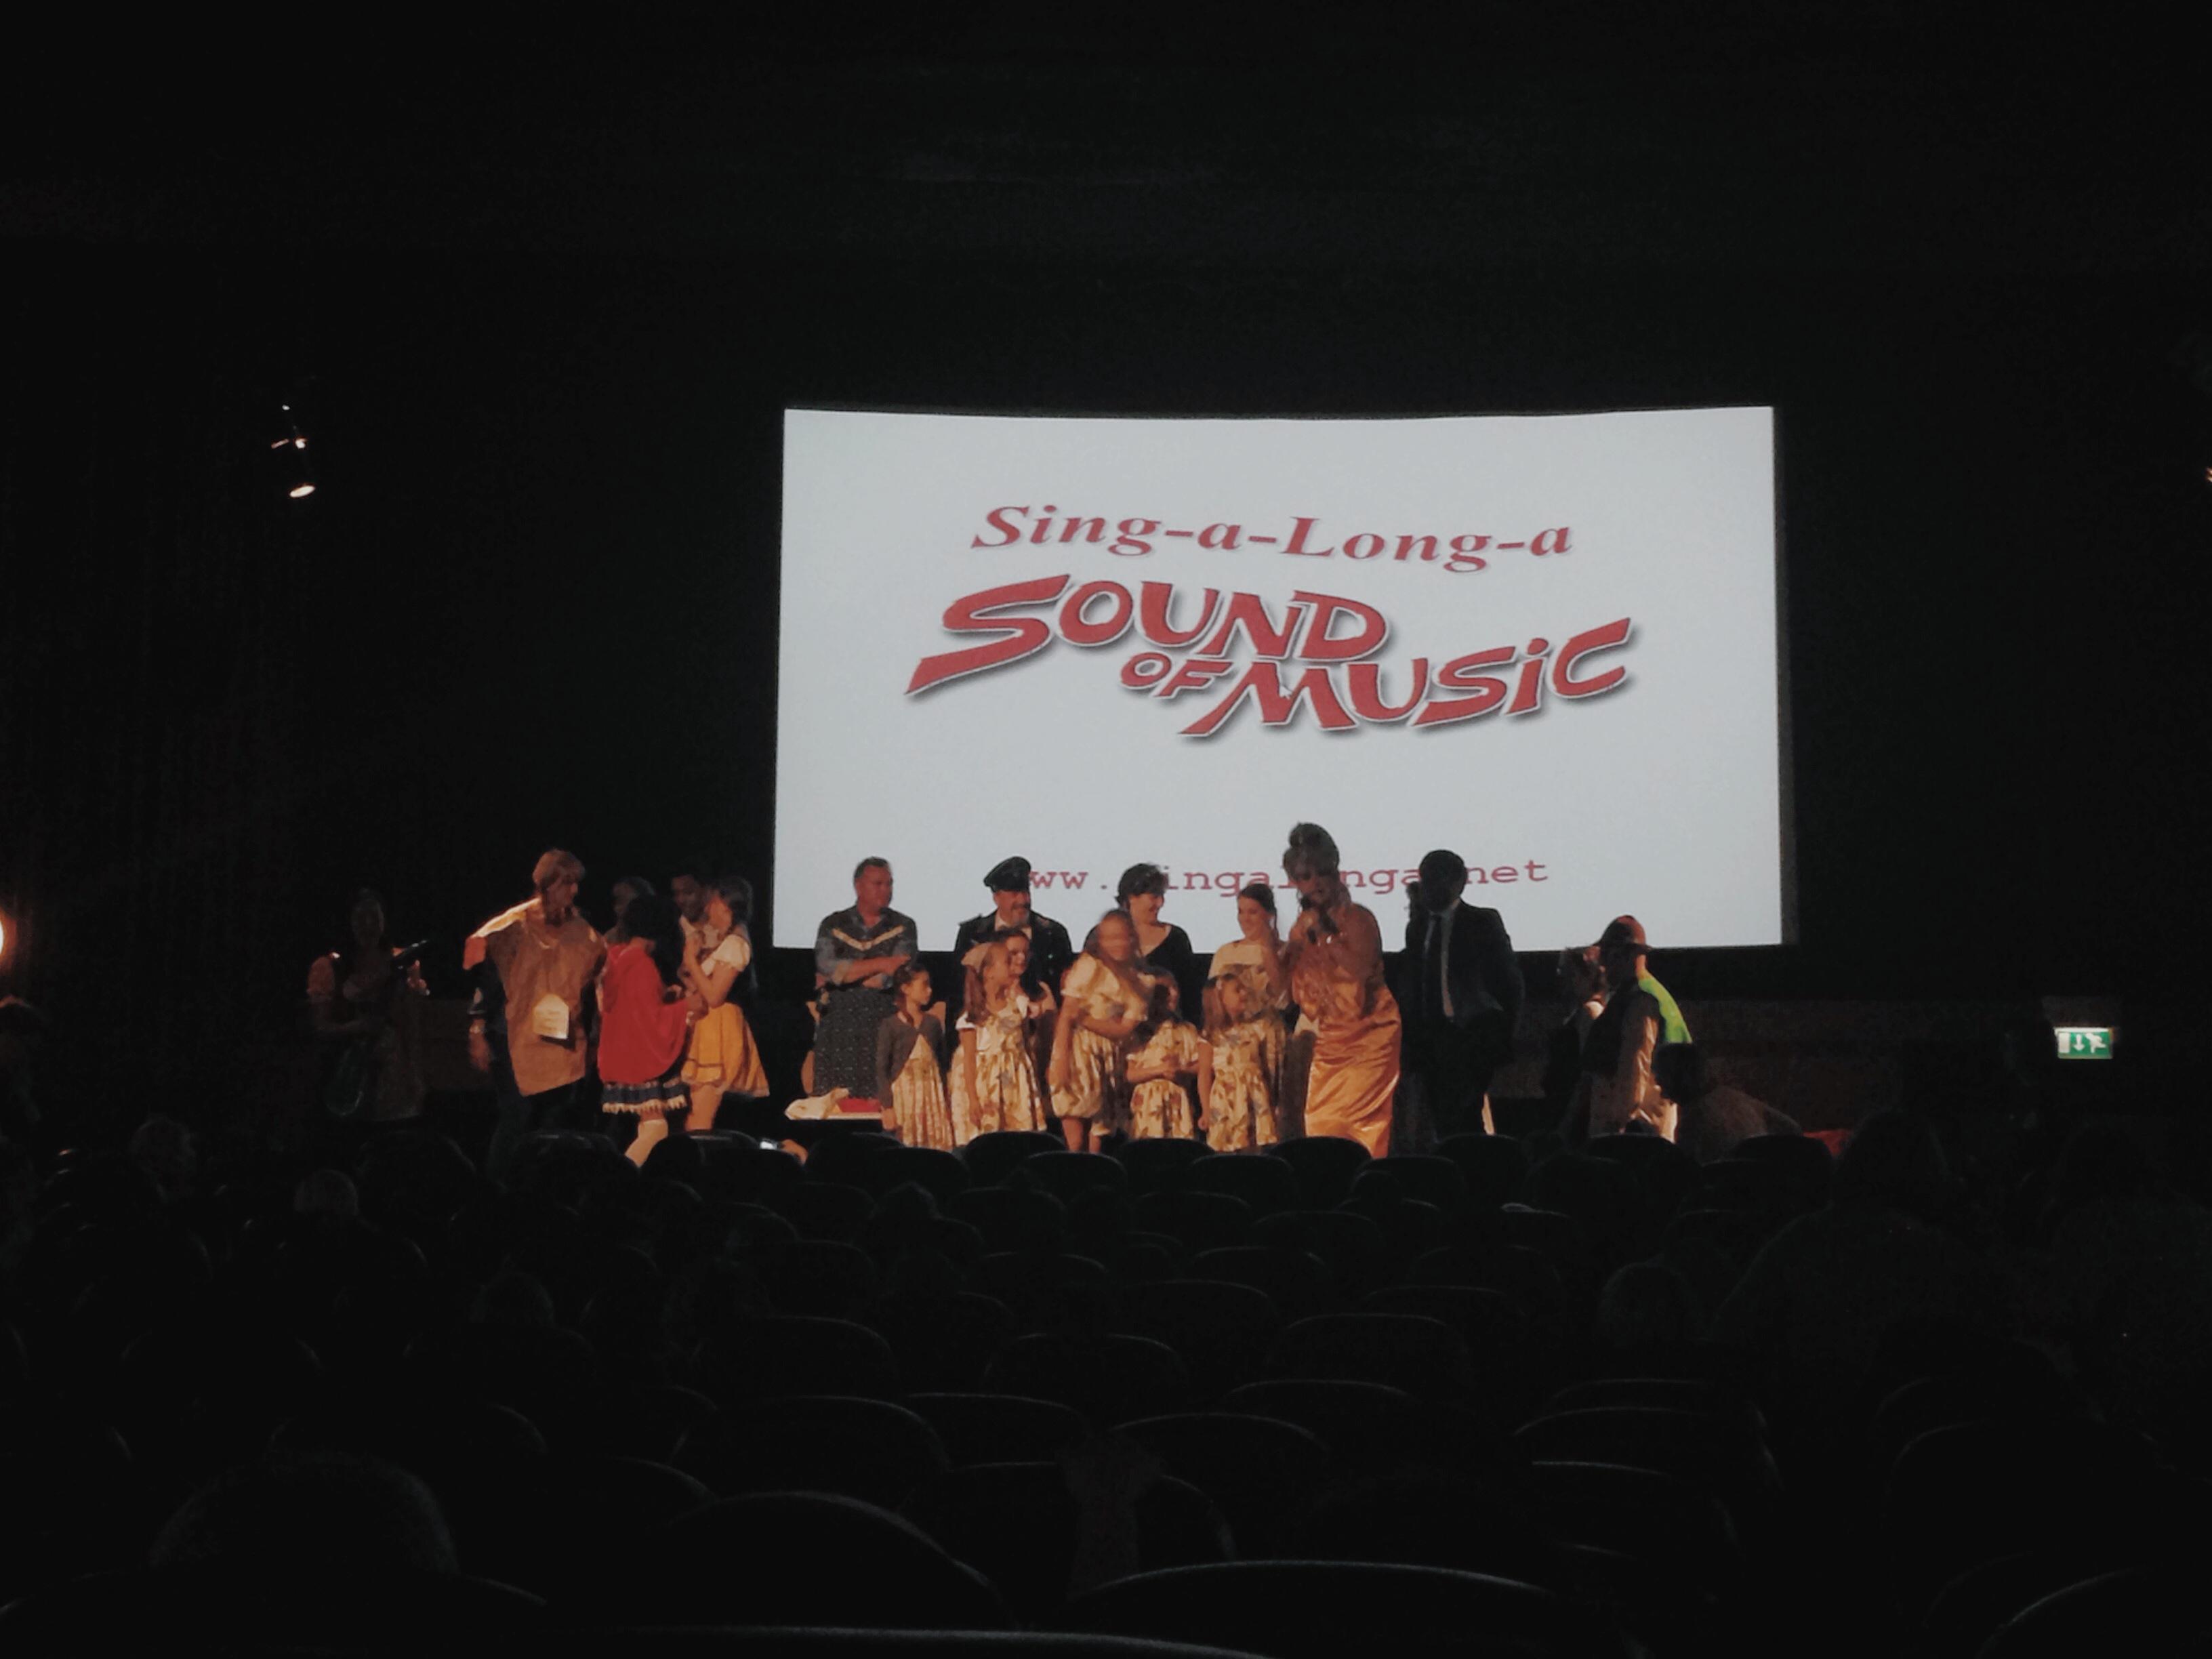 sing-a-long-a sound of music tutti insieme appassionatamente